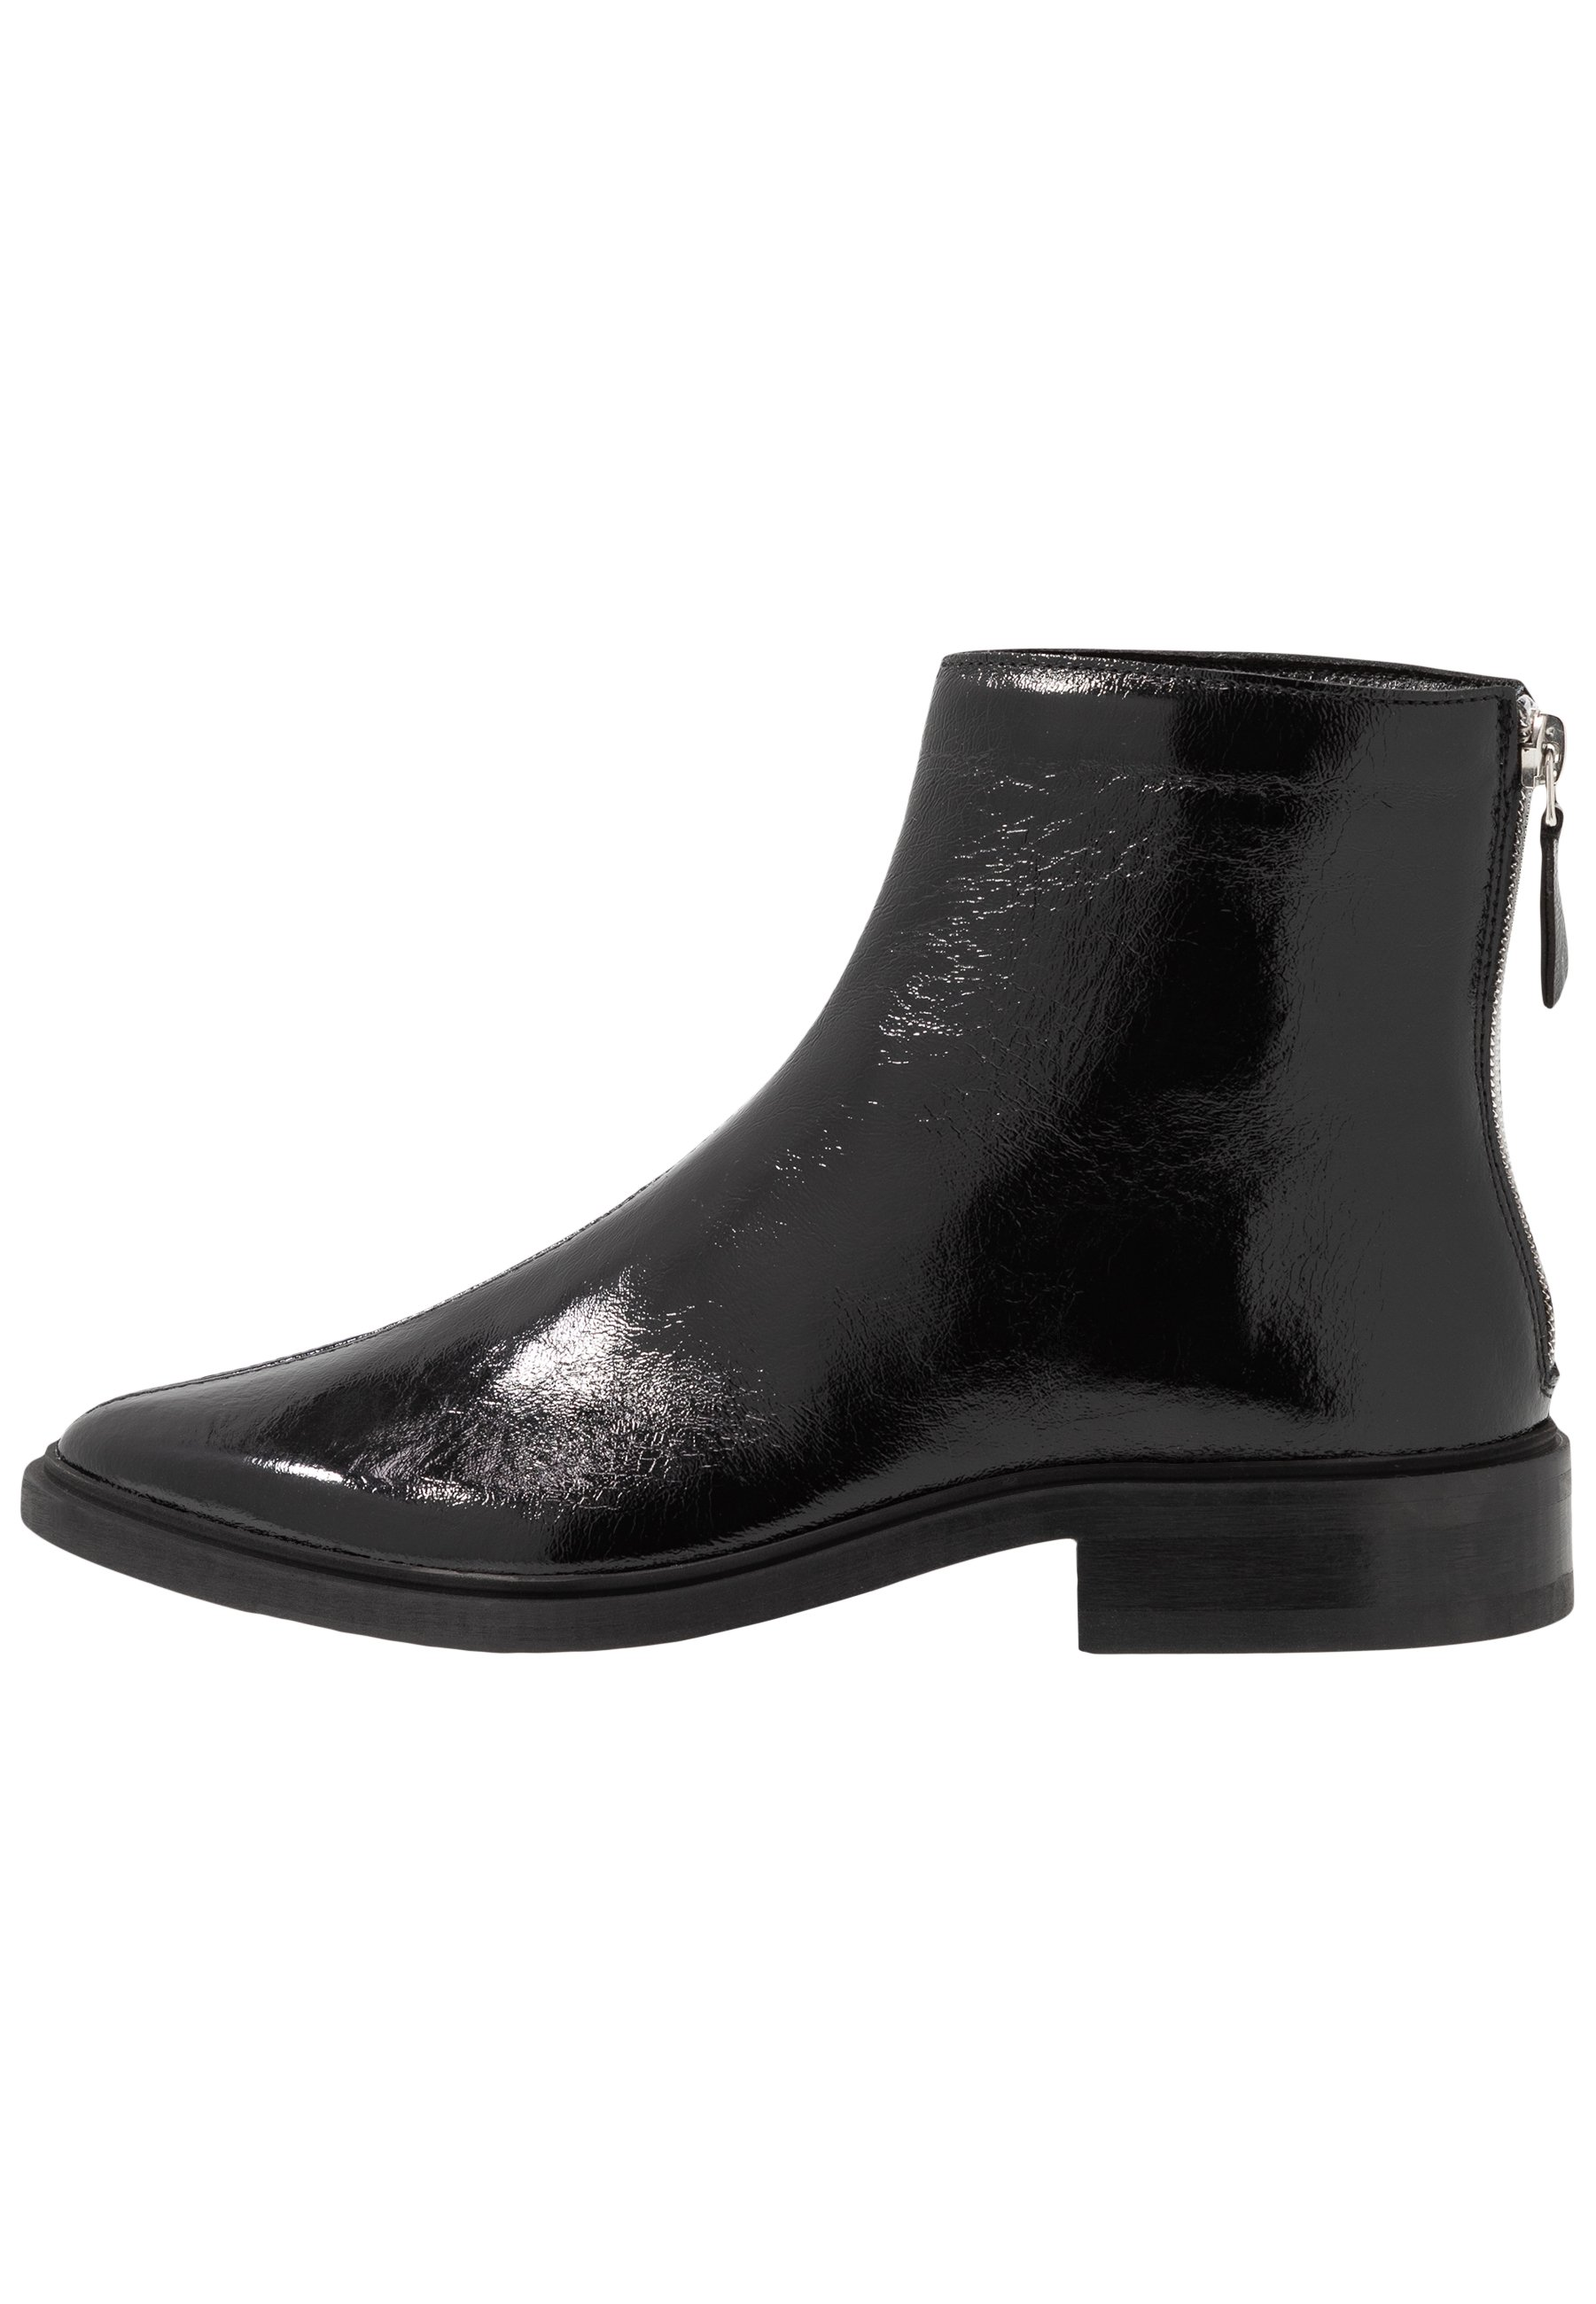 PRIME GLAZE BOOT Stövletter black